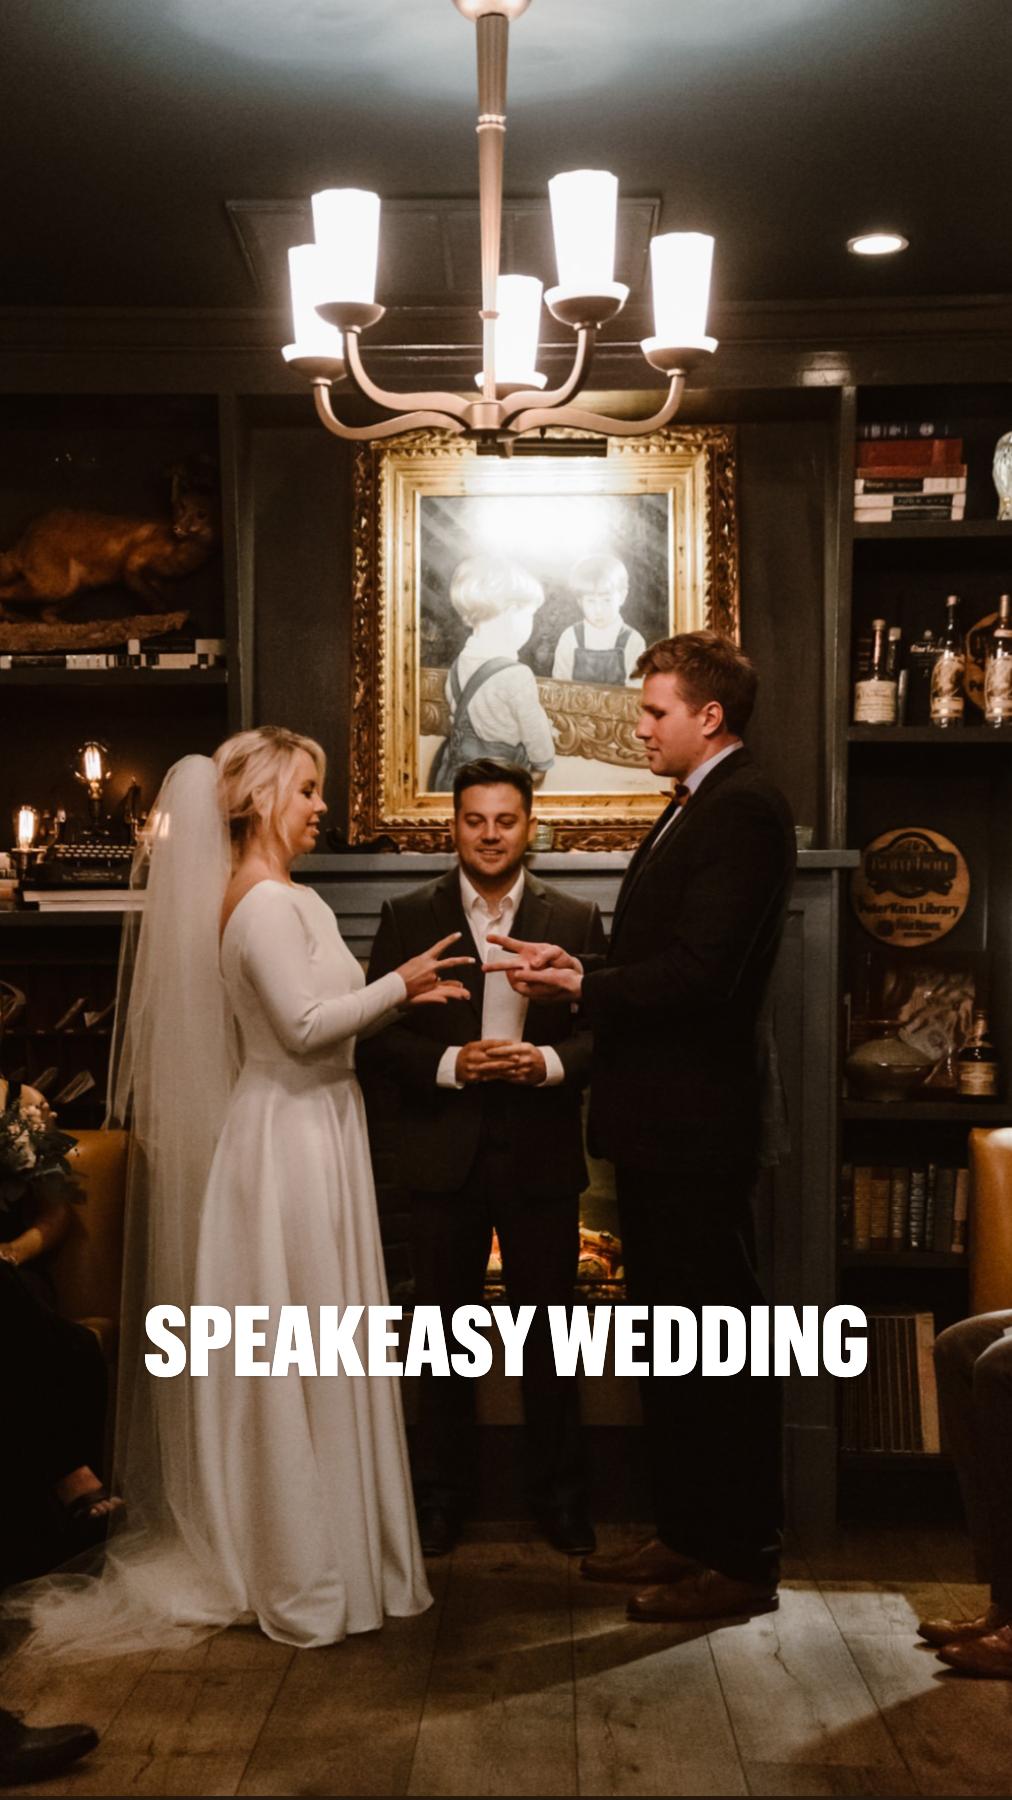 Speakeasy Wedding